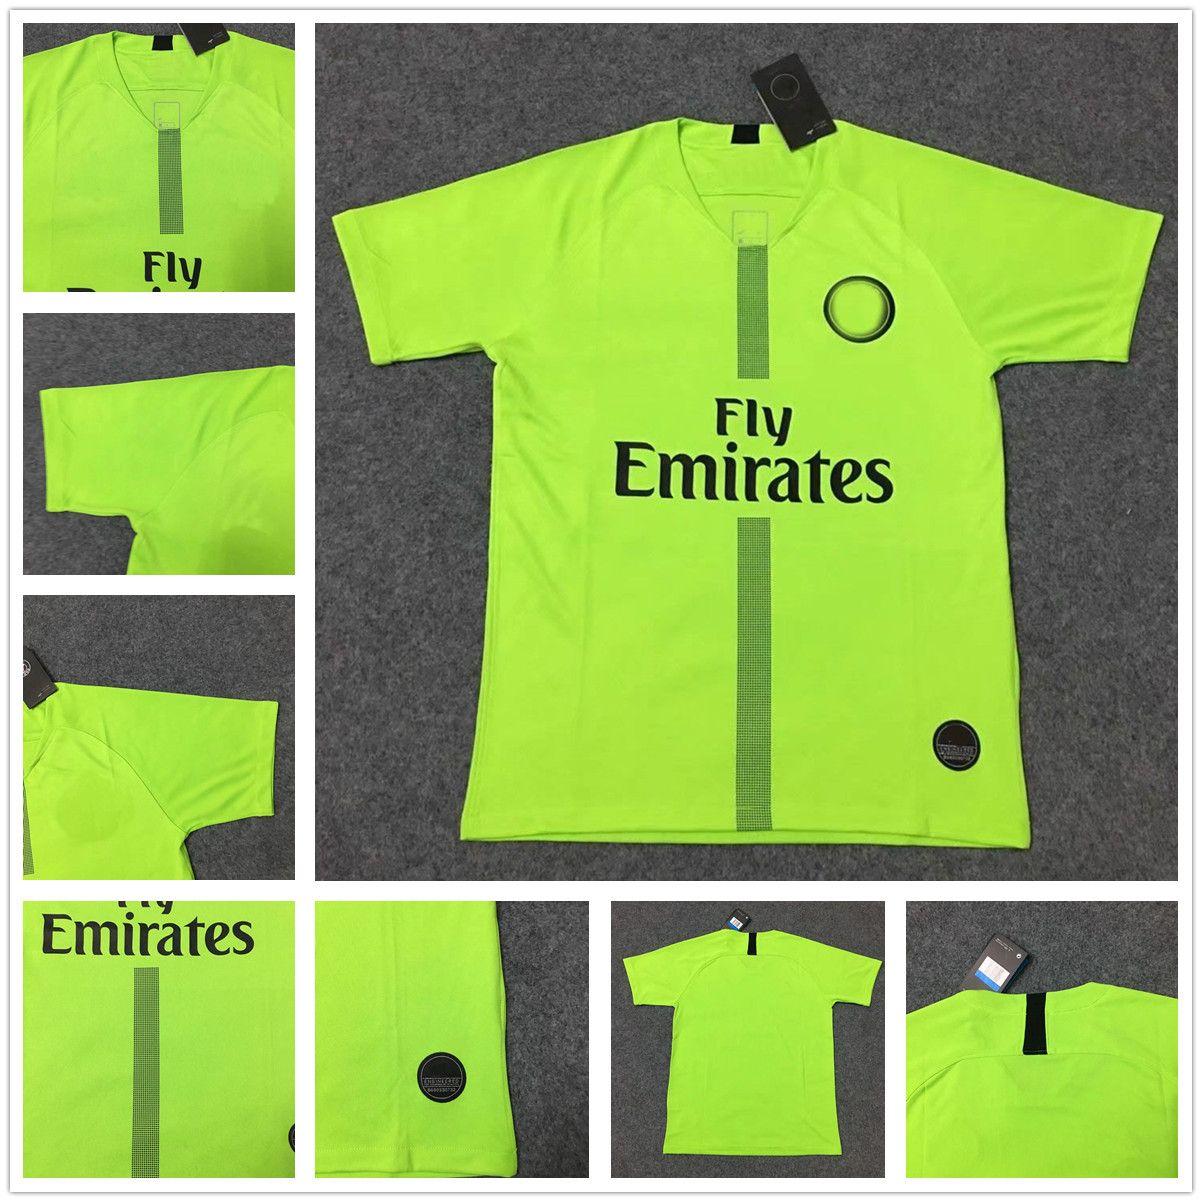 95238a26c 2019 2018 2019 Adults PSG Fluorescent Green Paris  1 Gianluigi Buffon  Goalkeeper  16 Areola 18 19 MBAPPE Champions Jerseys League Maillots From  Fanshomed2